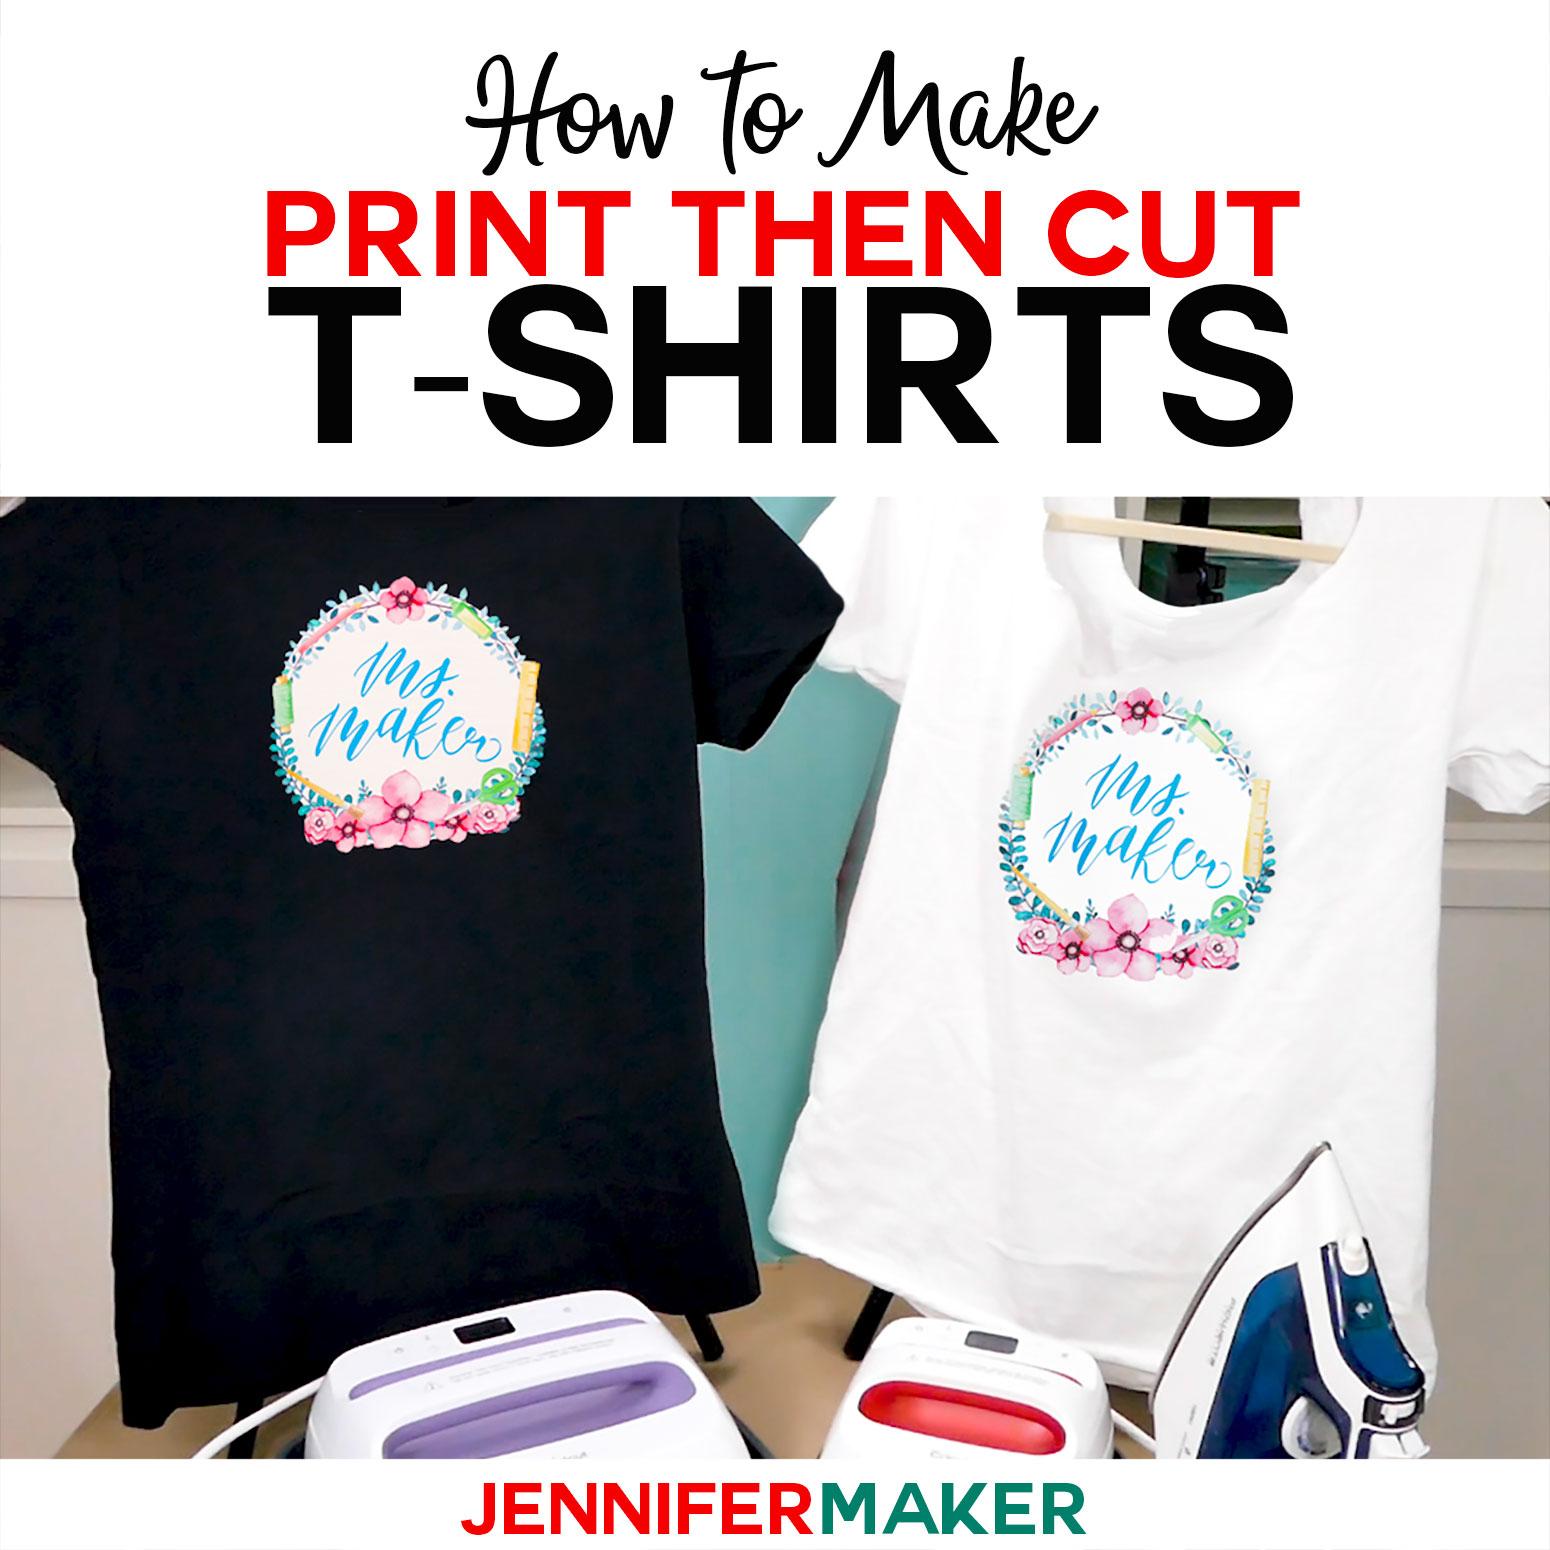 Print Then Cut Cricut Transfer T-Shirts - Jennifer Maker - Free Printable Iron On Transfers For T Shirts